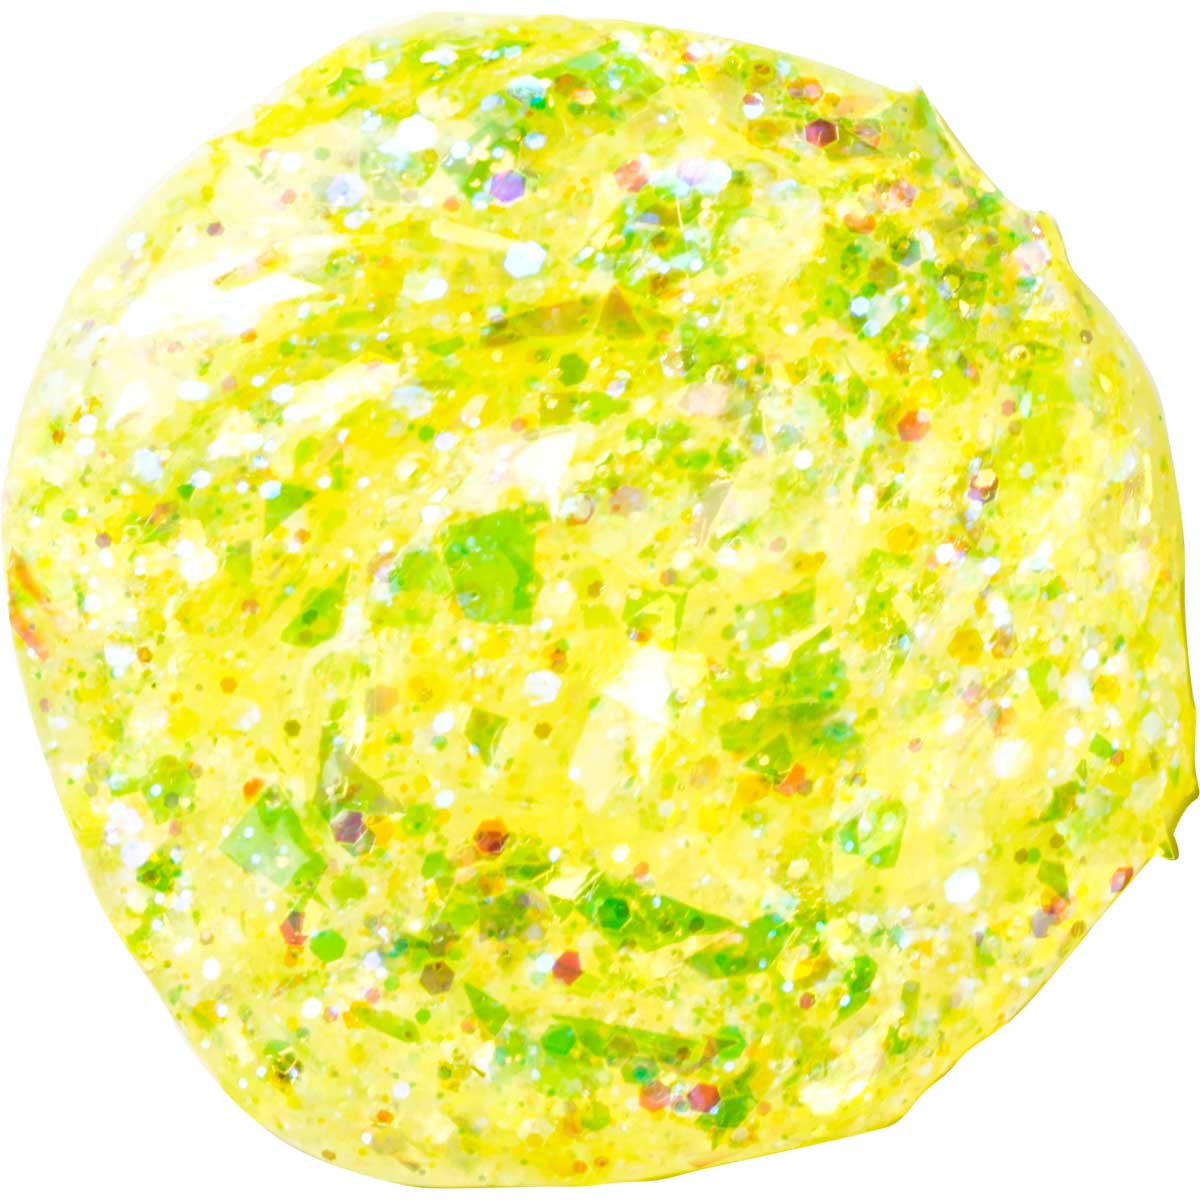 FolkArt ® Glitterific™ Acrylic Paint - Neon Yellow, 2 oz. - 44390